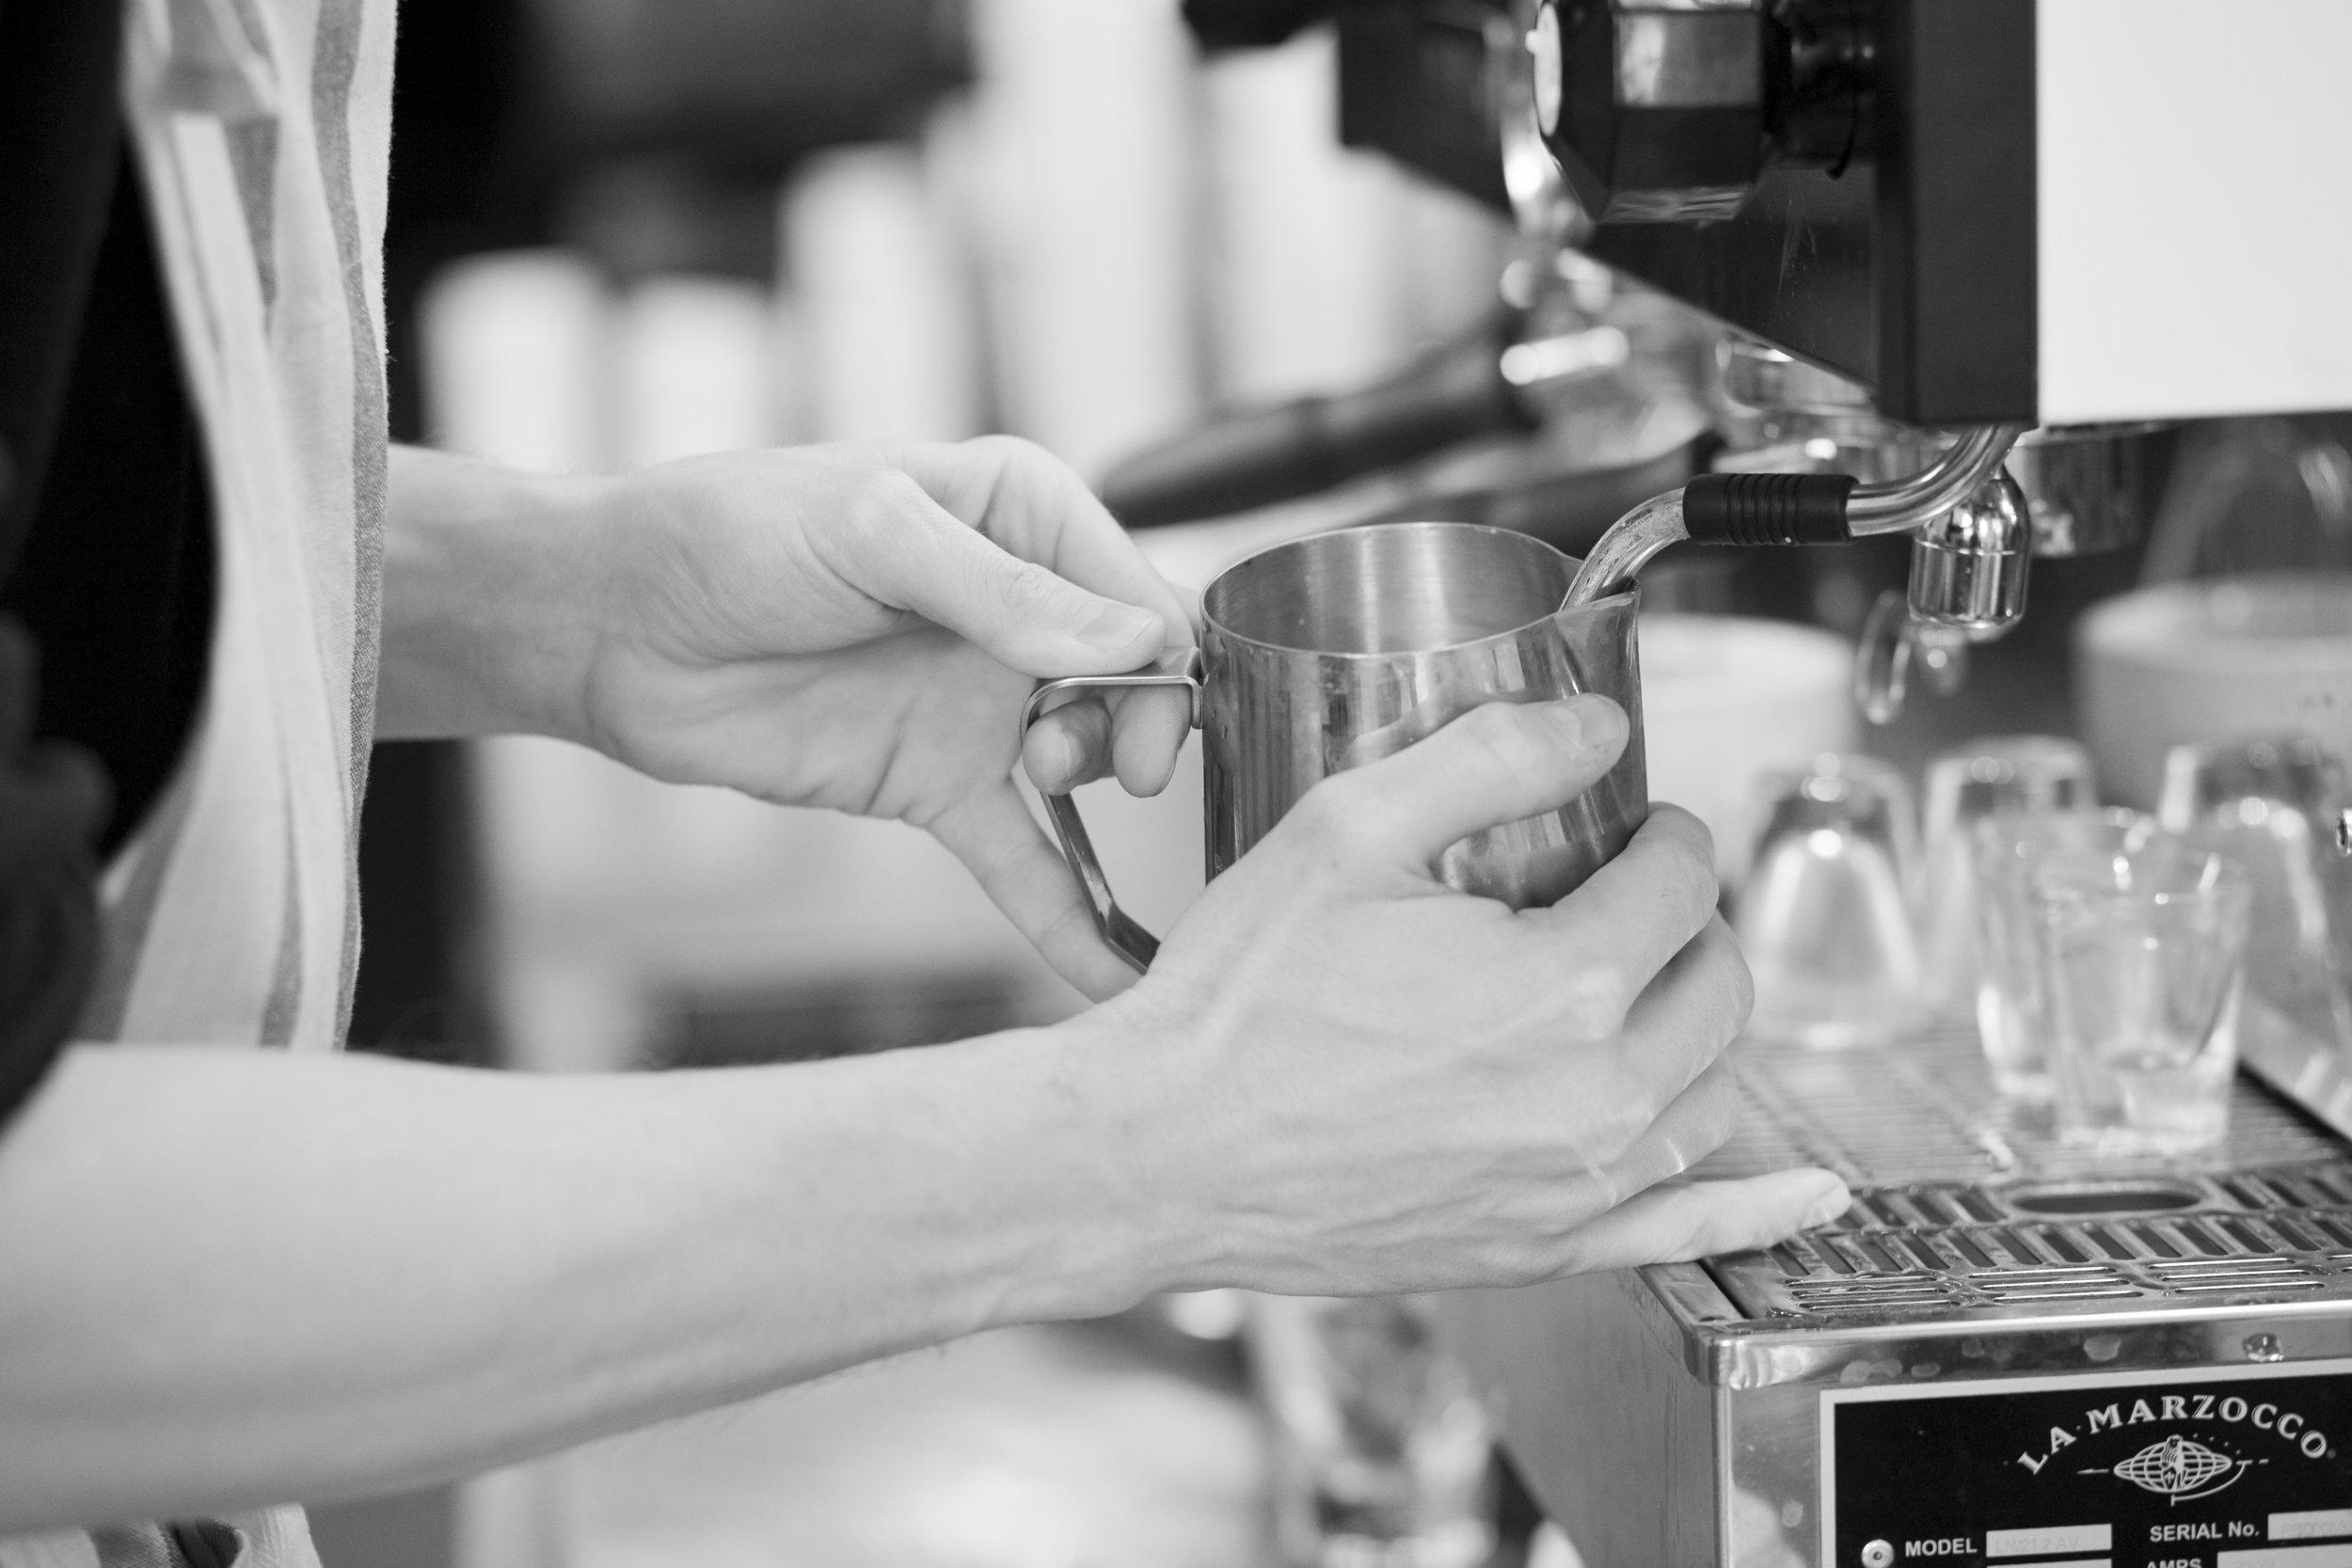 A barista steaming milk at an espresso machine